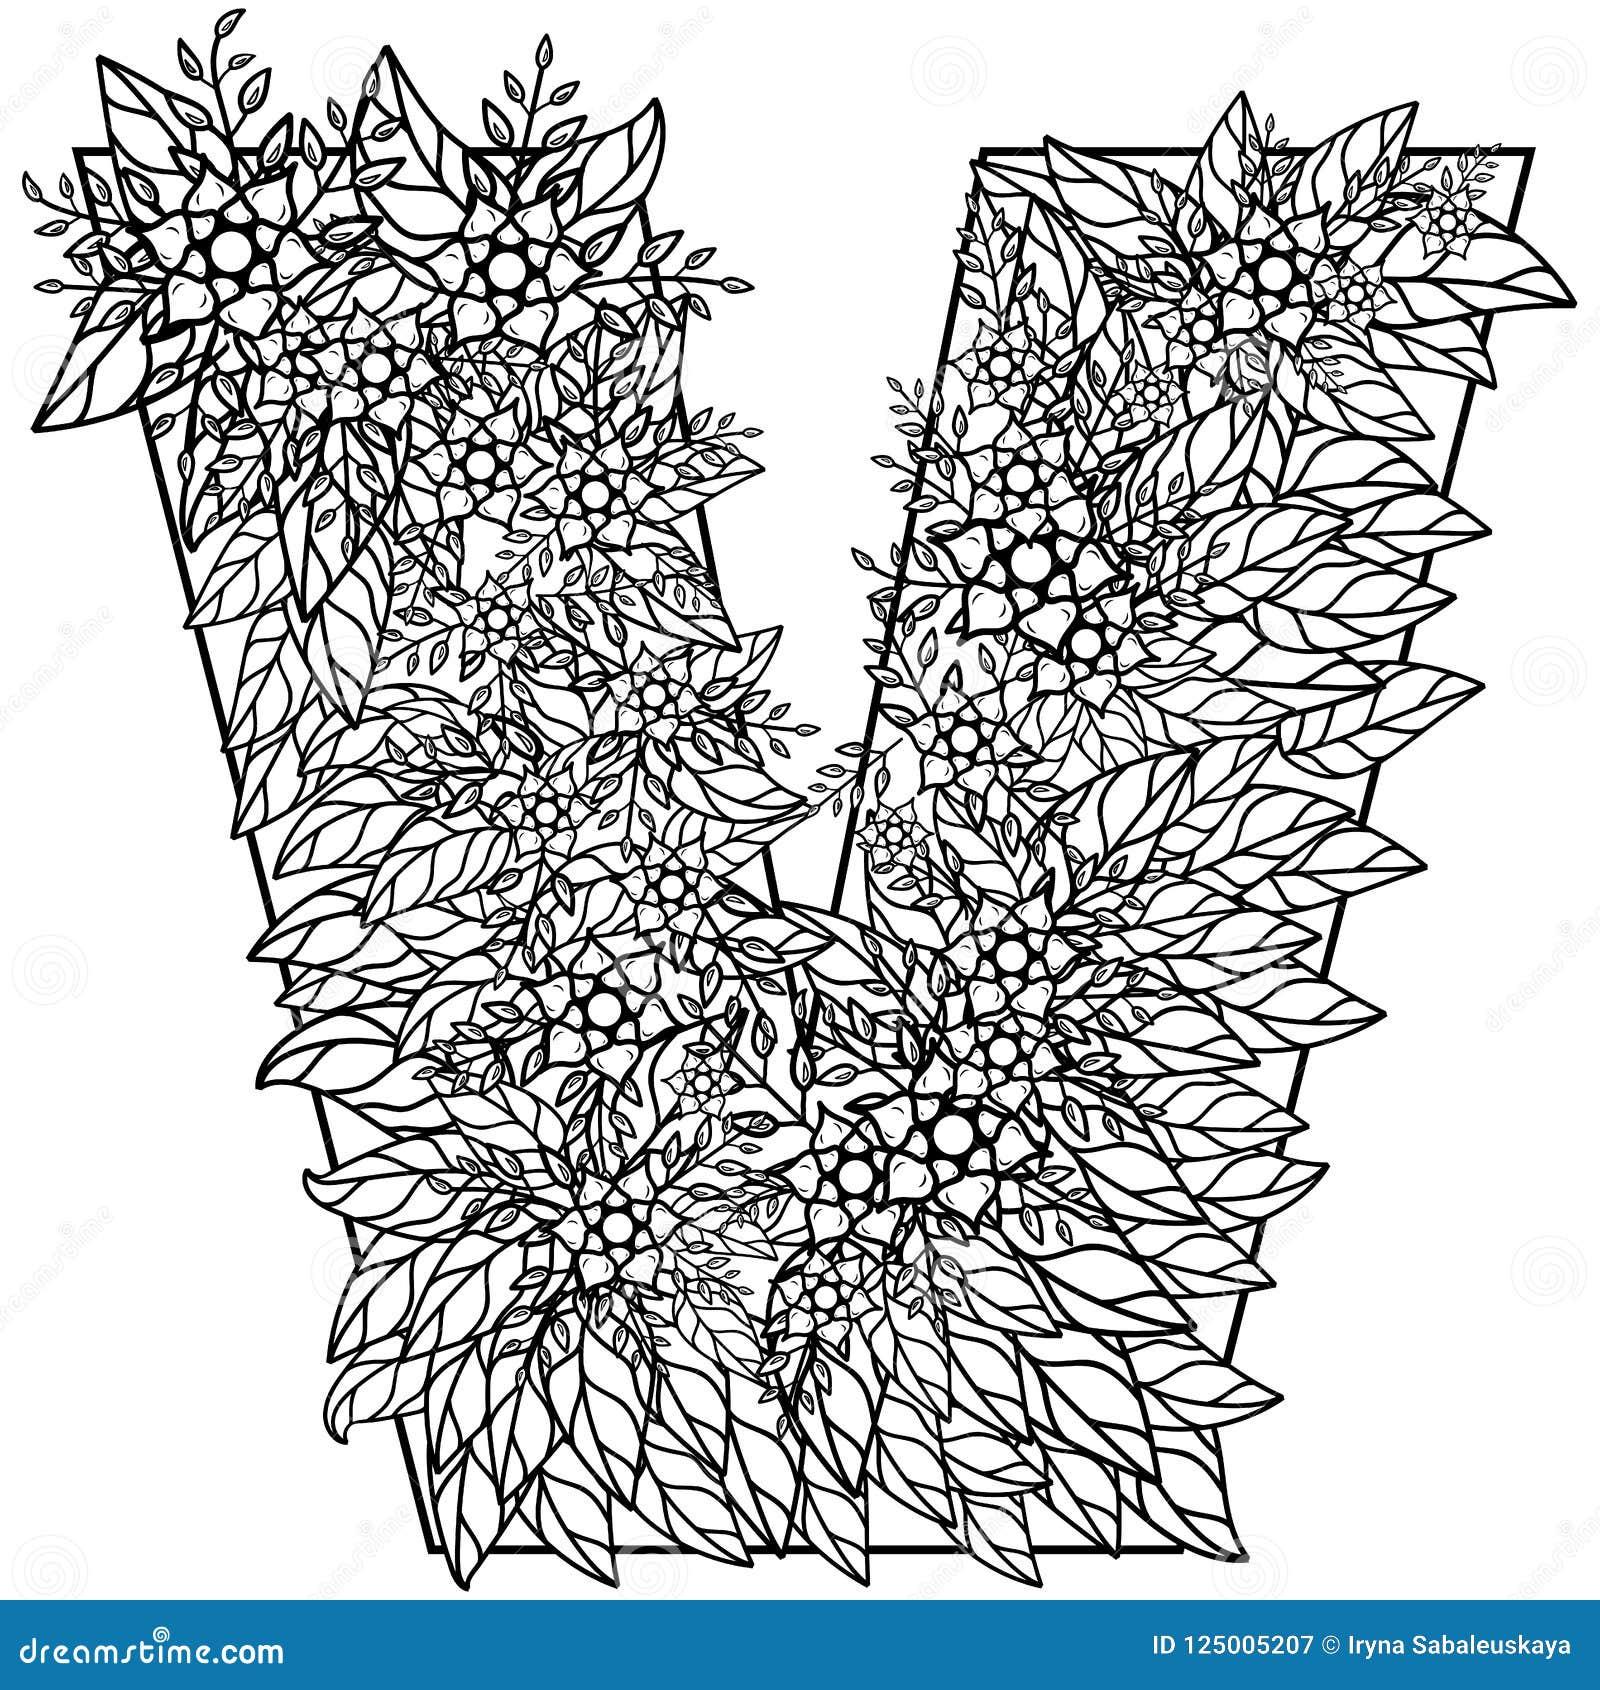 Carta V Dibujo De Dudling Mandala Alfabeto En El Estilo De Dudling